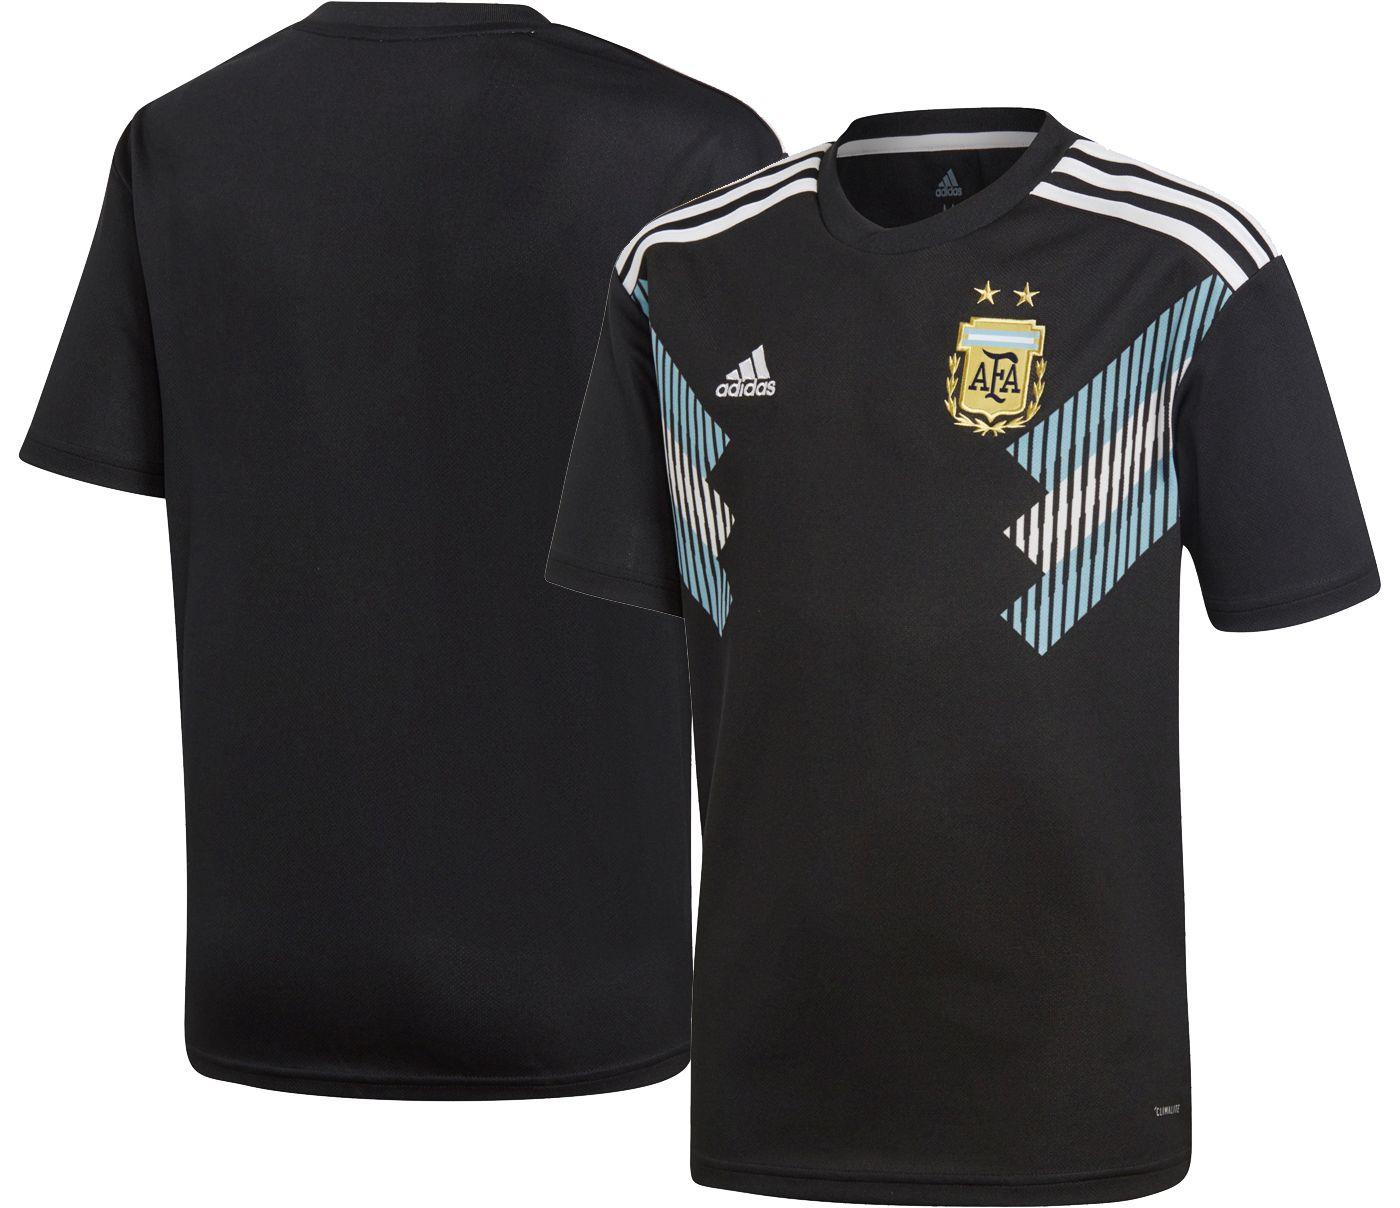 adidas Youth 2018 FIFA World Cup Argentina Stadium Away Replica Jersey